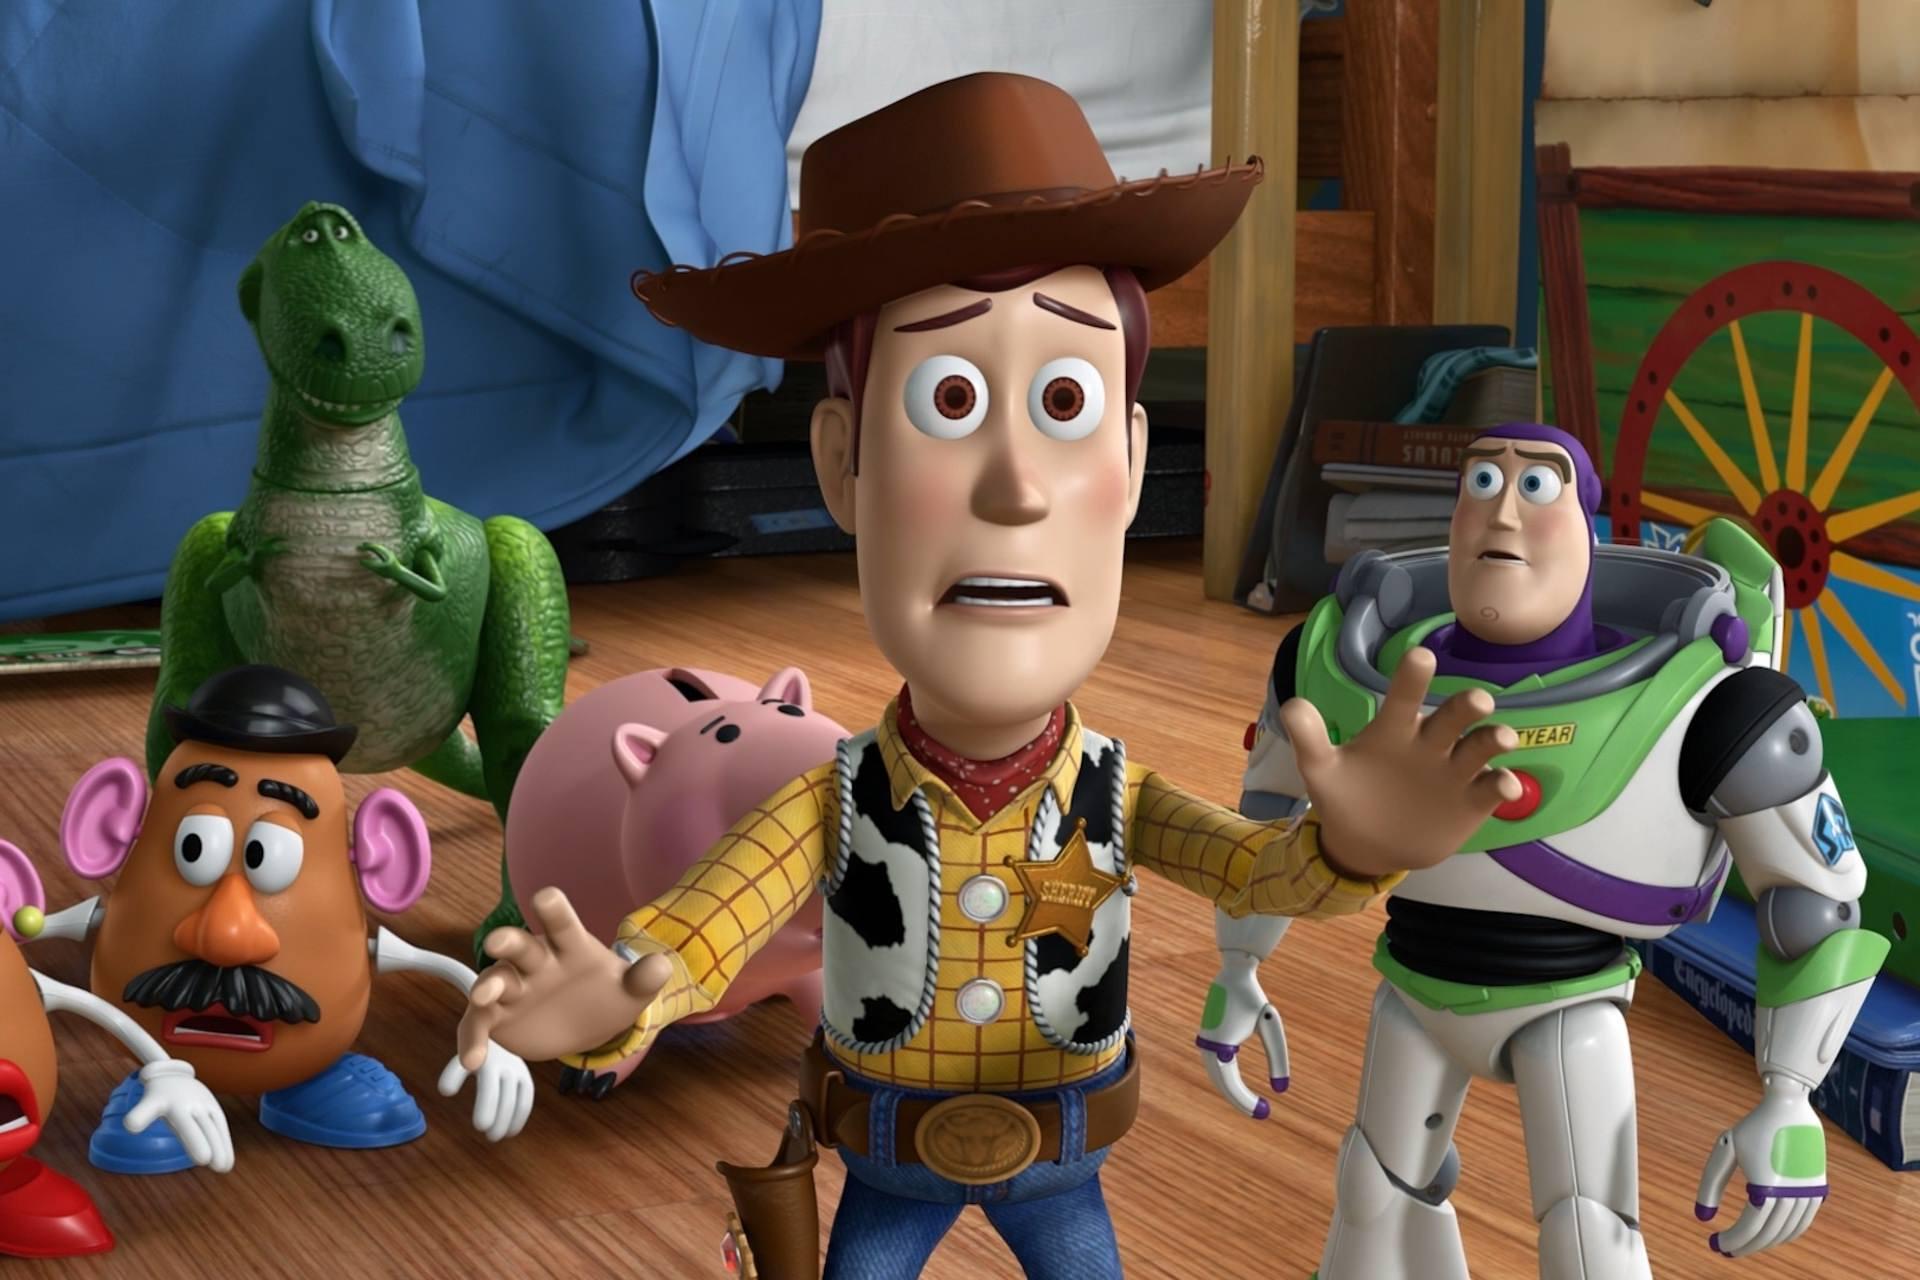 pixar-toy-story-3